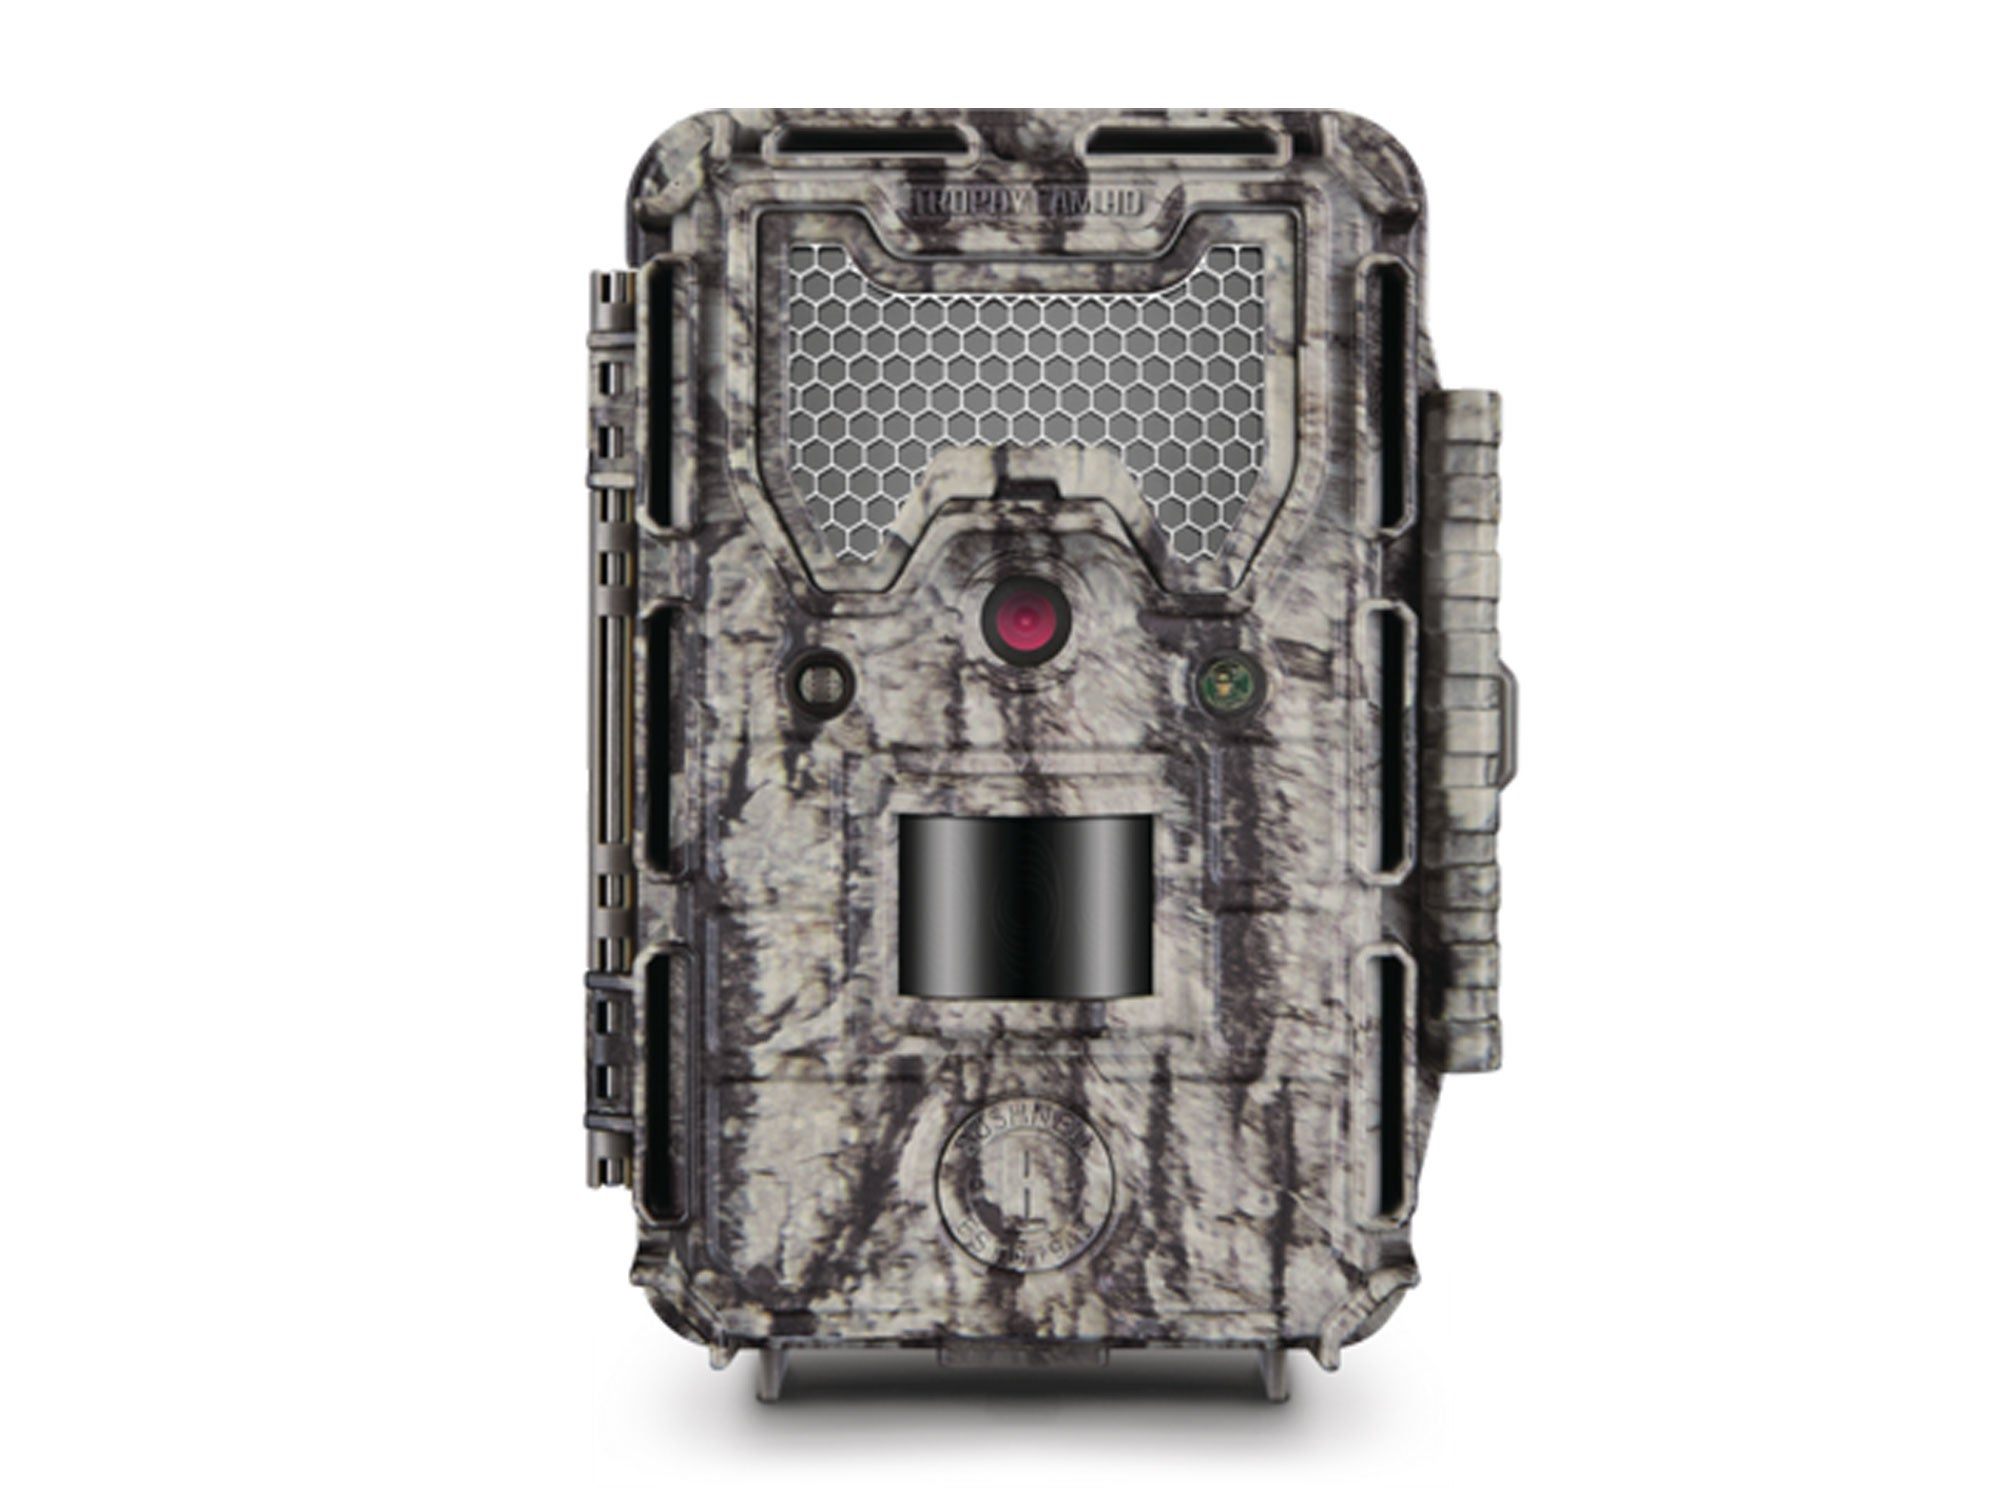 Bushnell Aggressor Game Camera